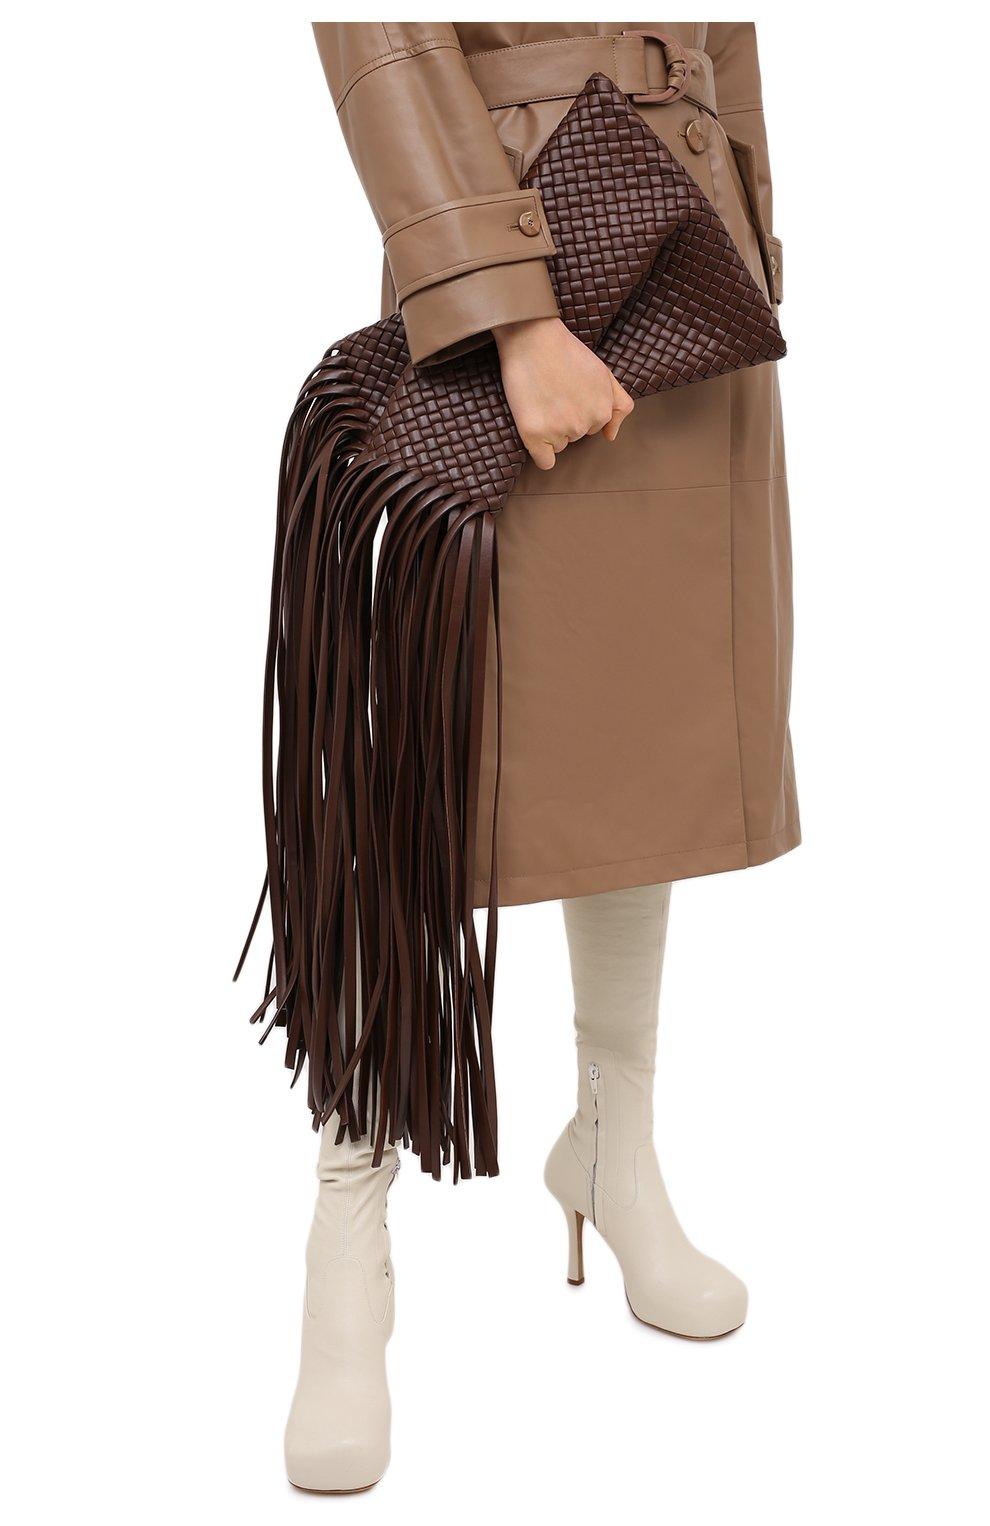 Женский клатч bv fringe crisscross BOTTEGA VENETA коричневого цвета, арт. 642104/V01D1   Фото 2